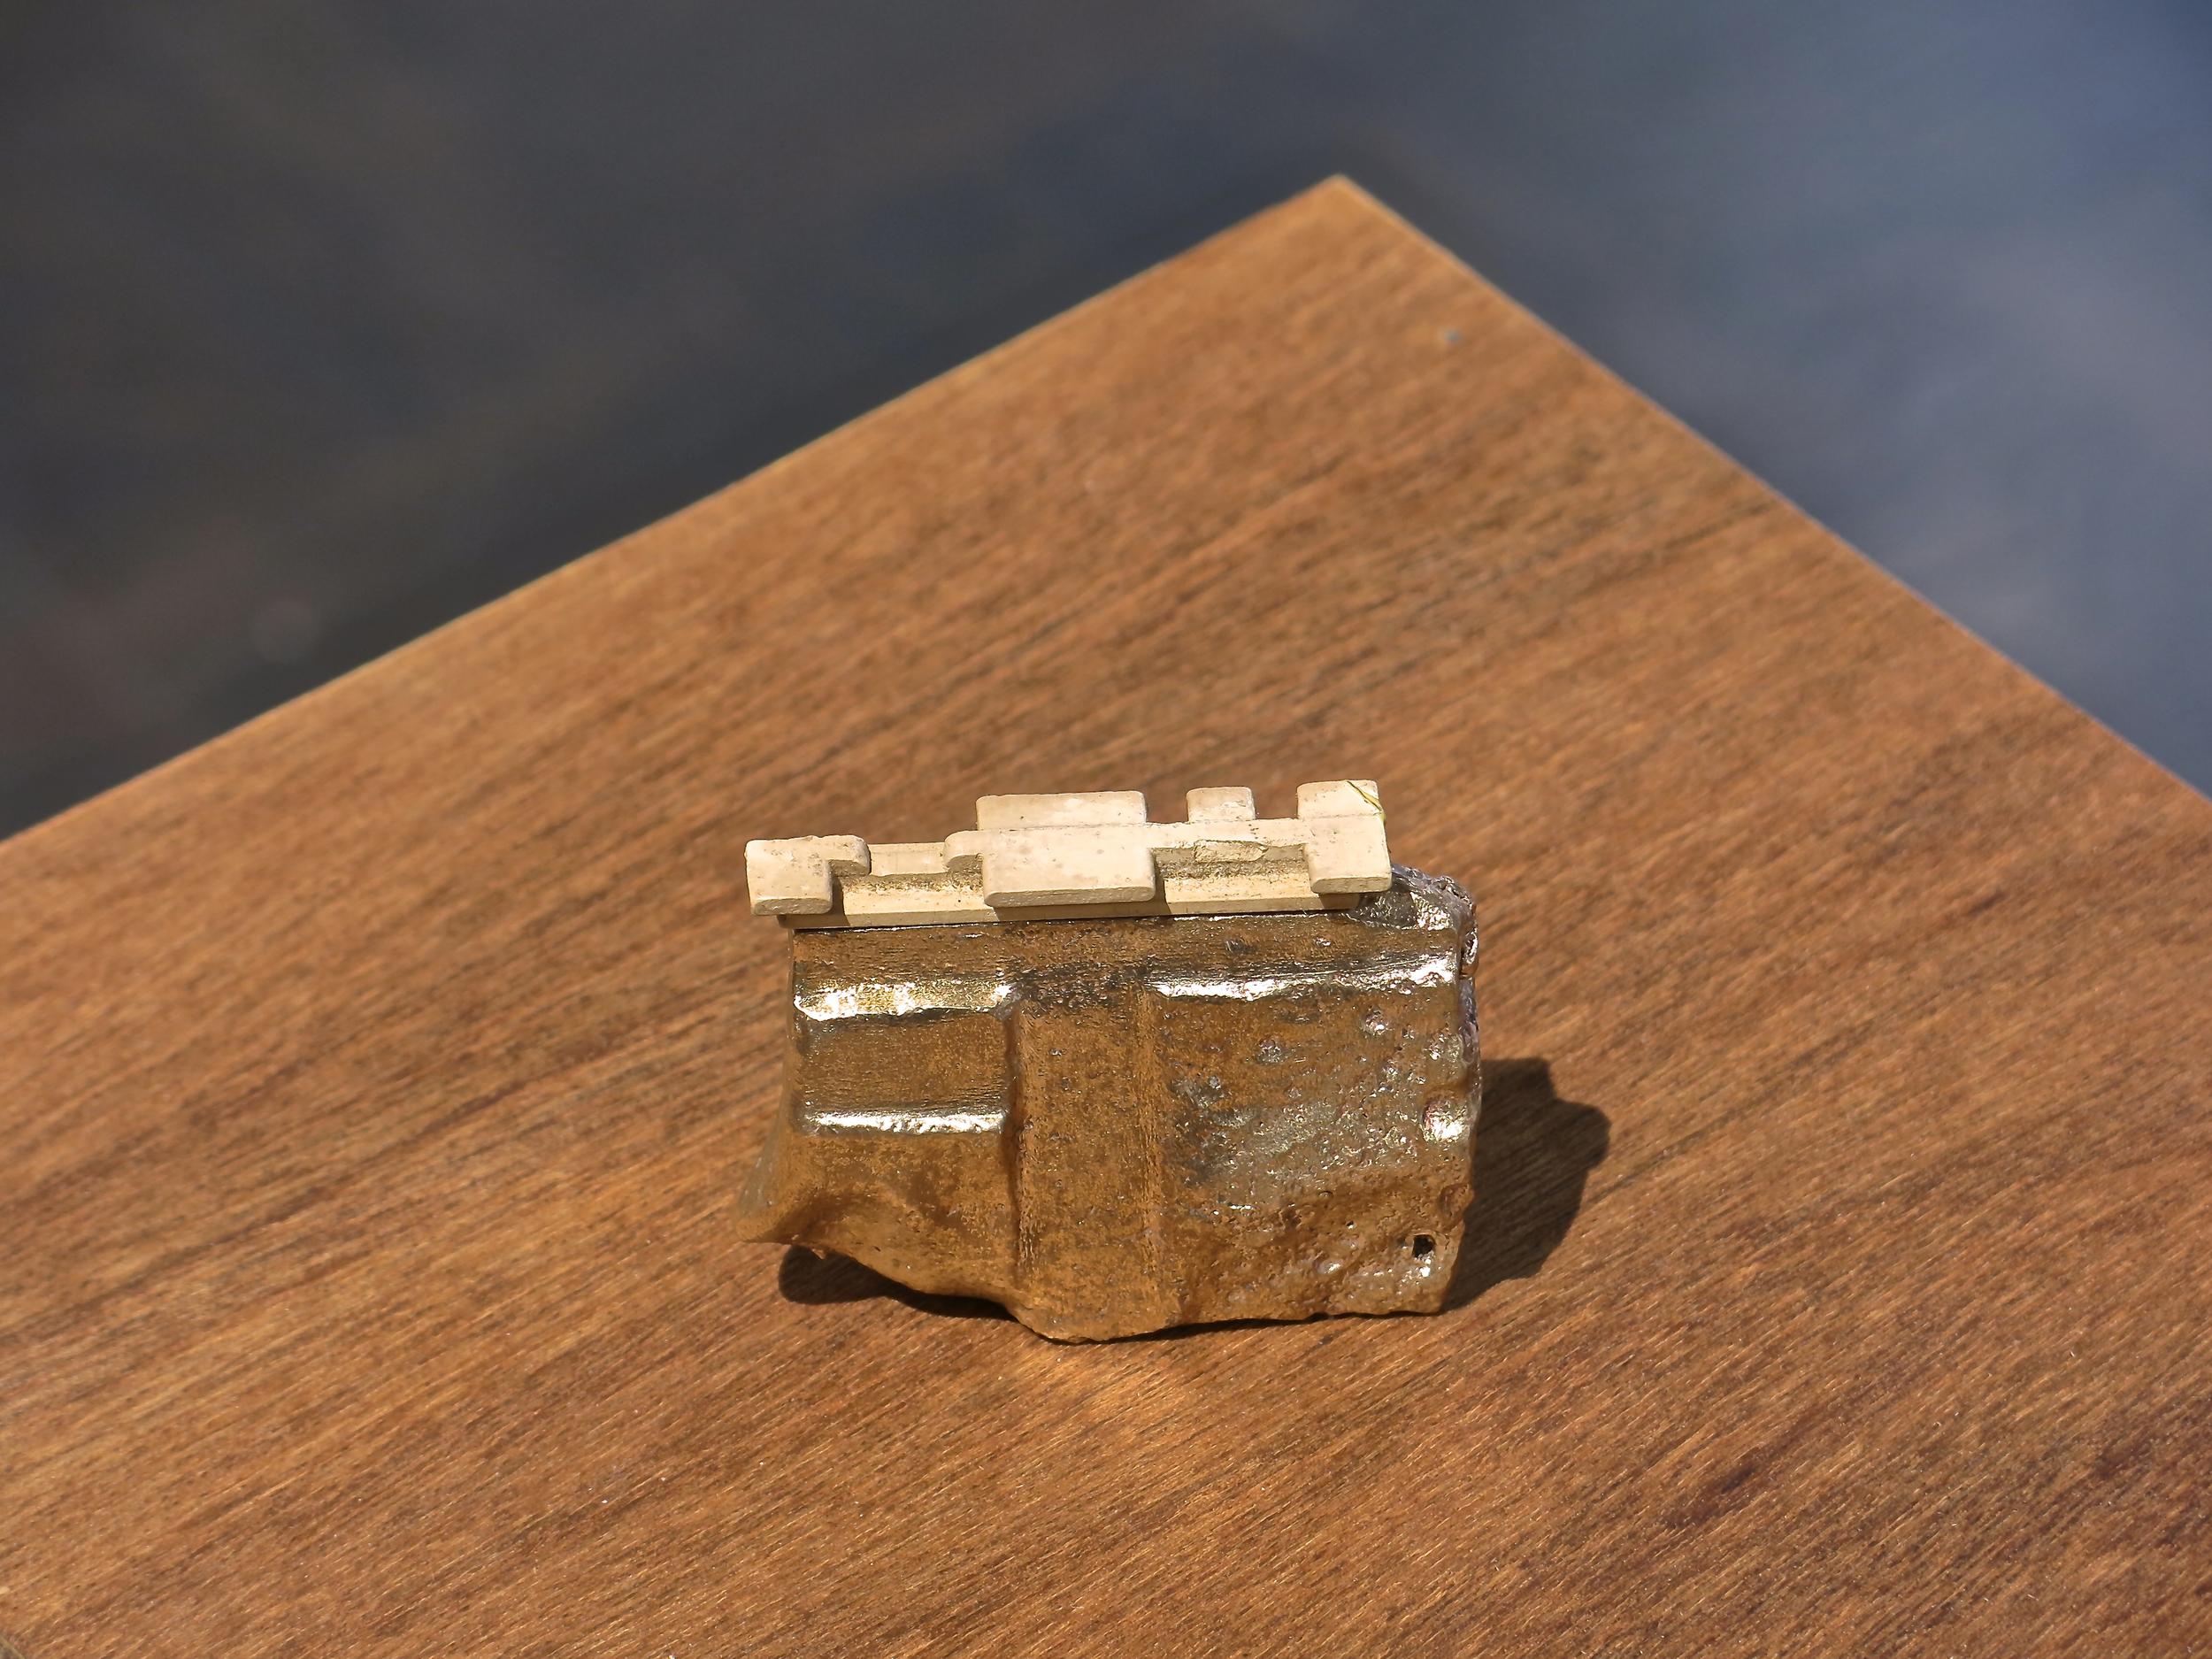 "Broken #8 | H. 2.5"" W. 2.5"" D. 1"" | Bronze and found object | Year 2014 | Photo: Mazdak Shadkam"